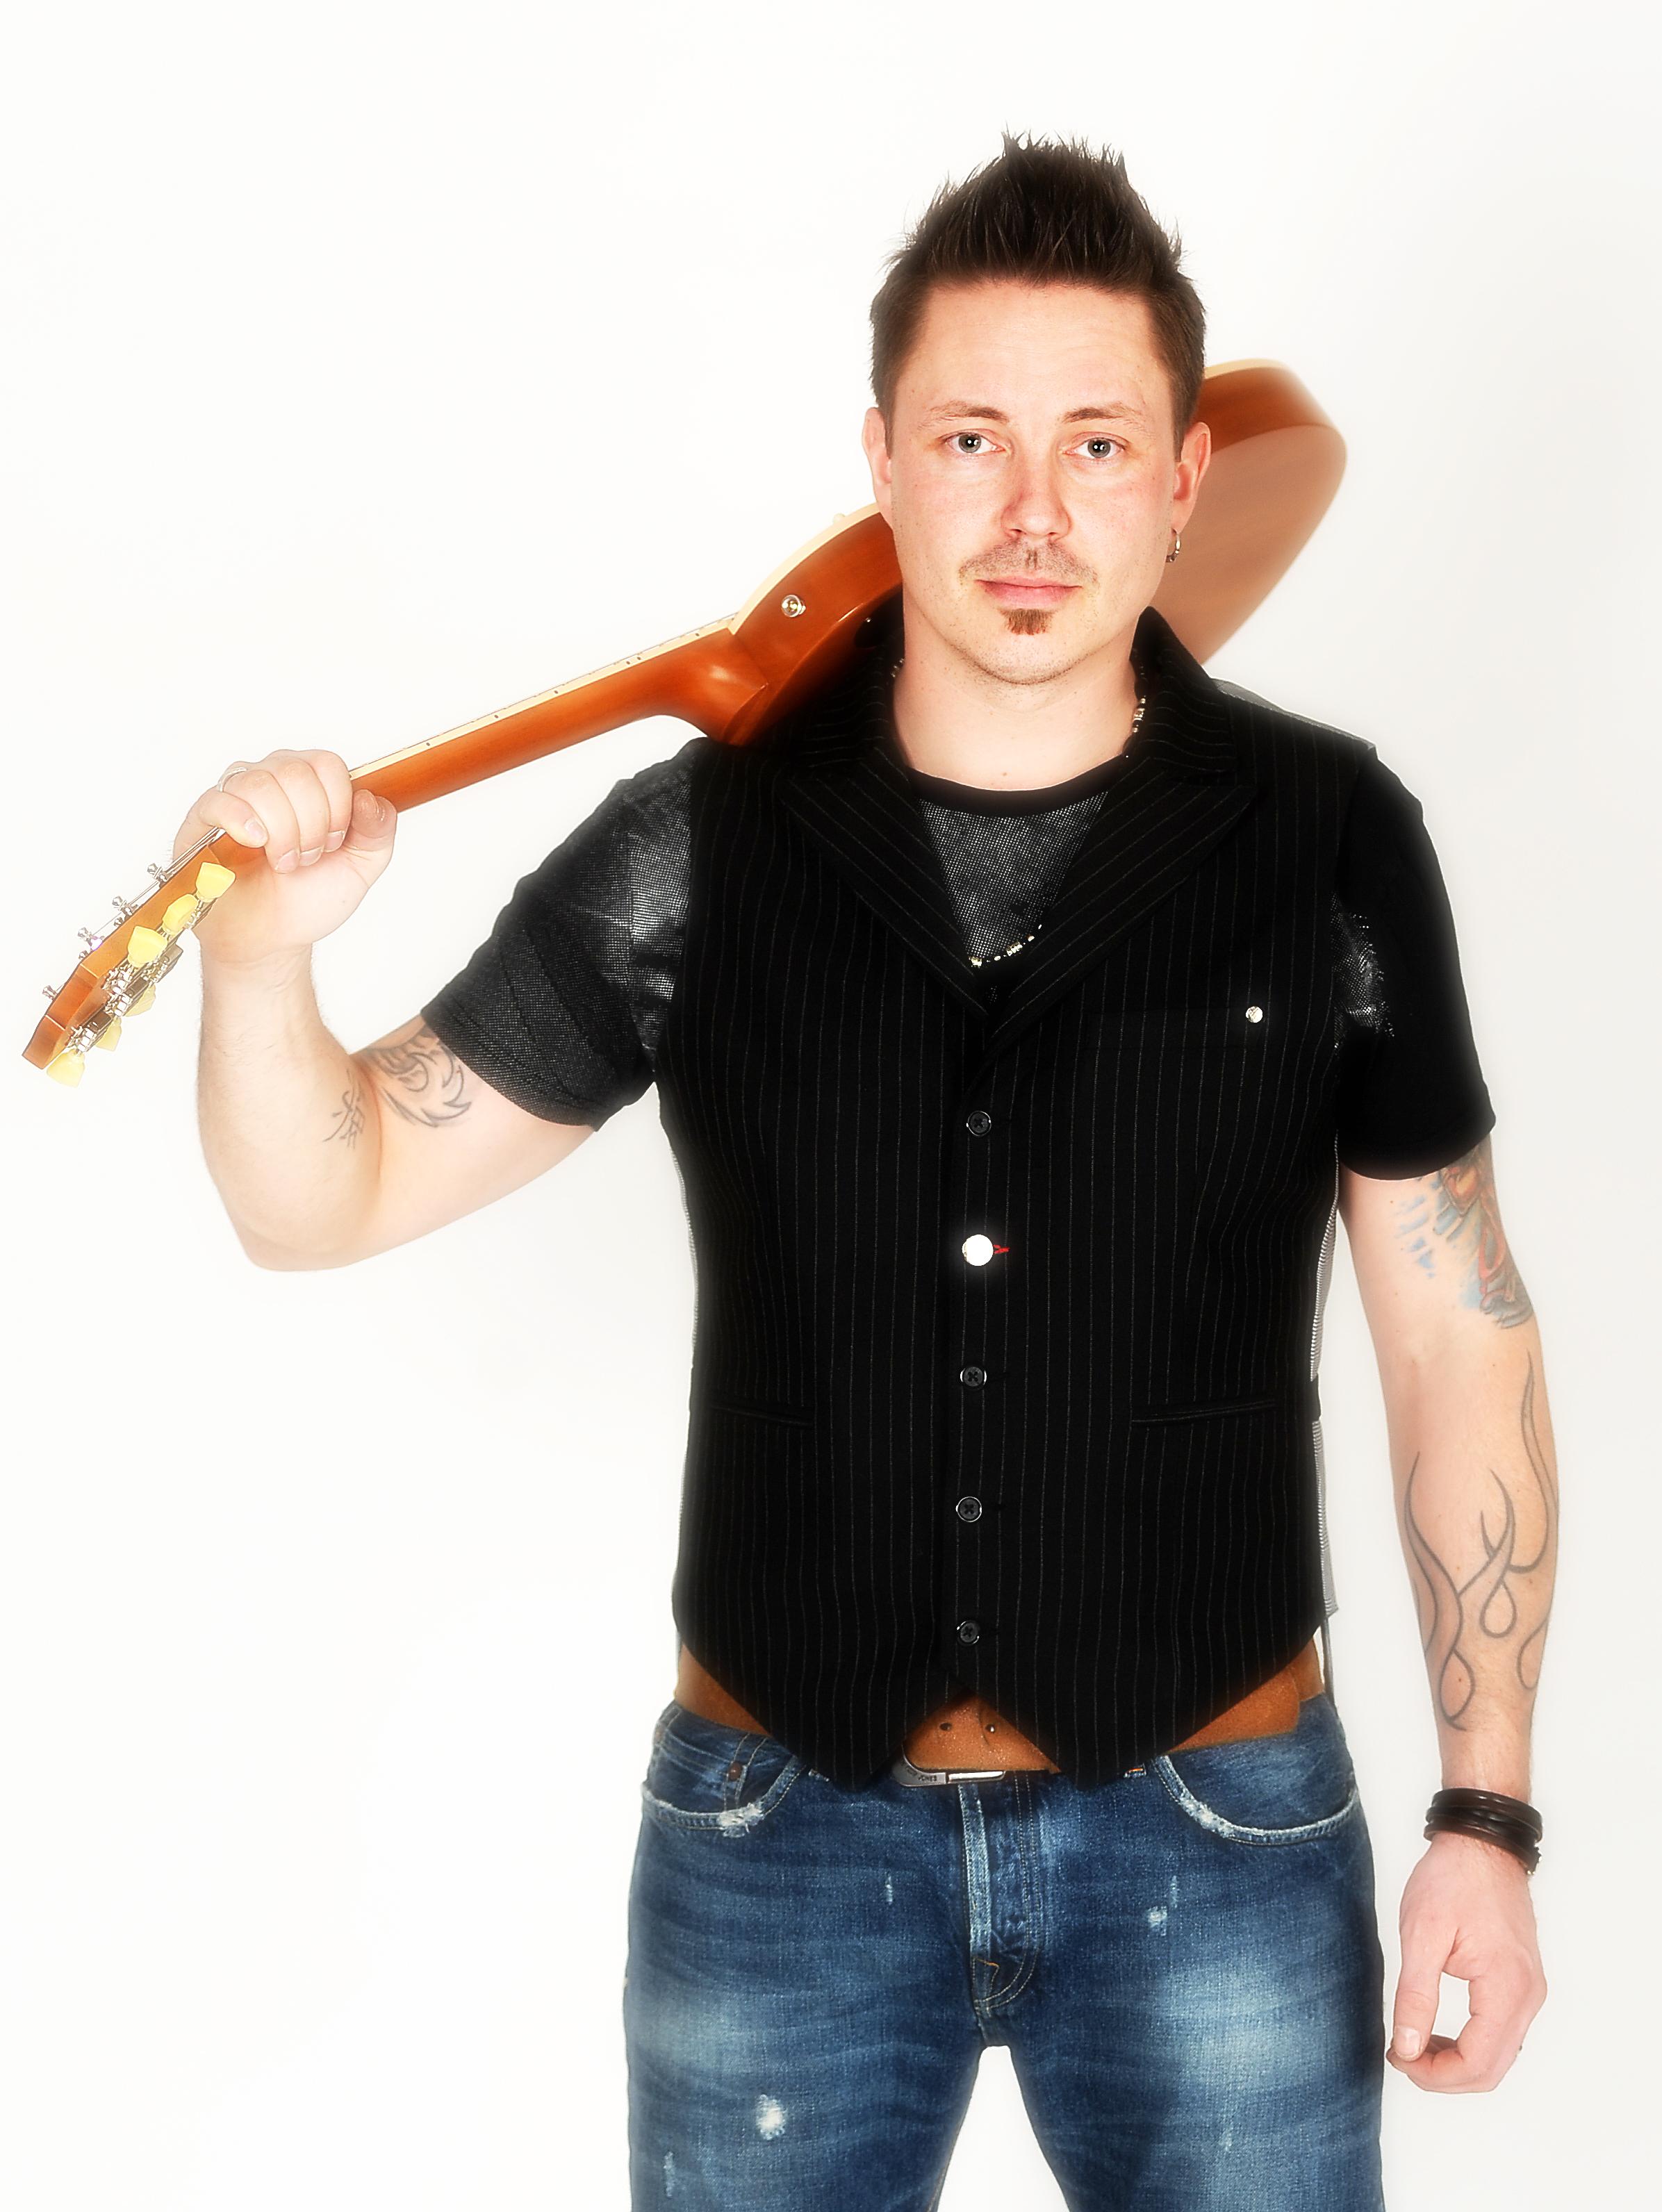 Mikko, vinnare av The Voice of Finland 2012